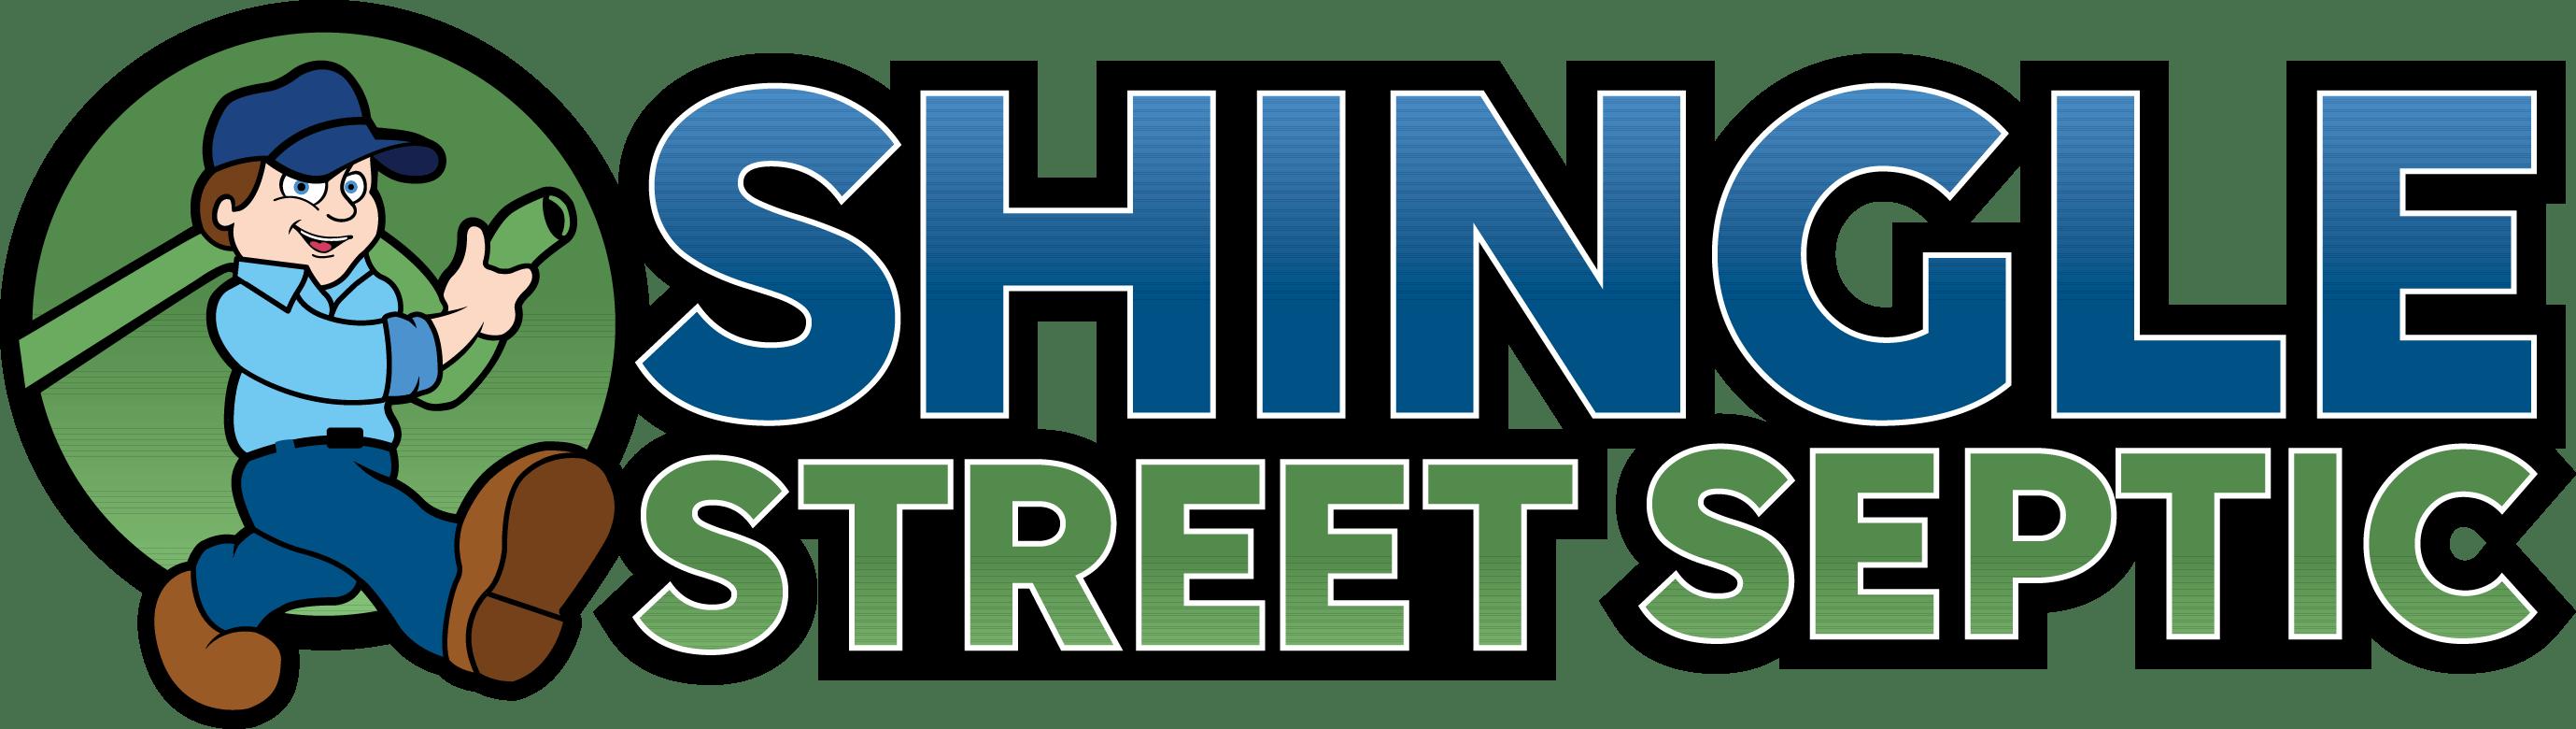 Shingle Street Septic Tank Services